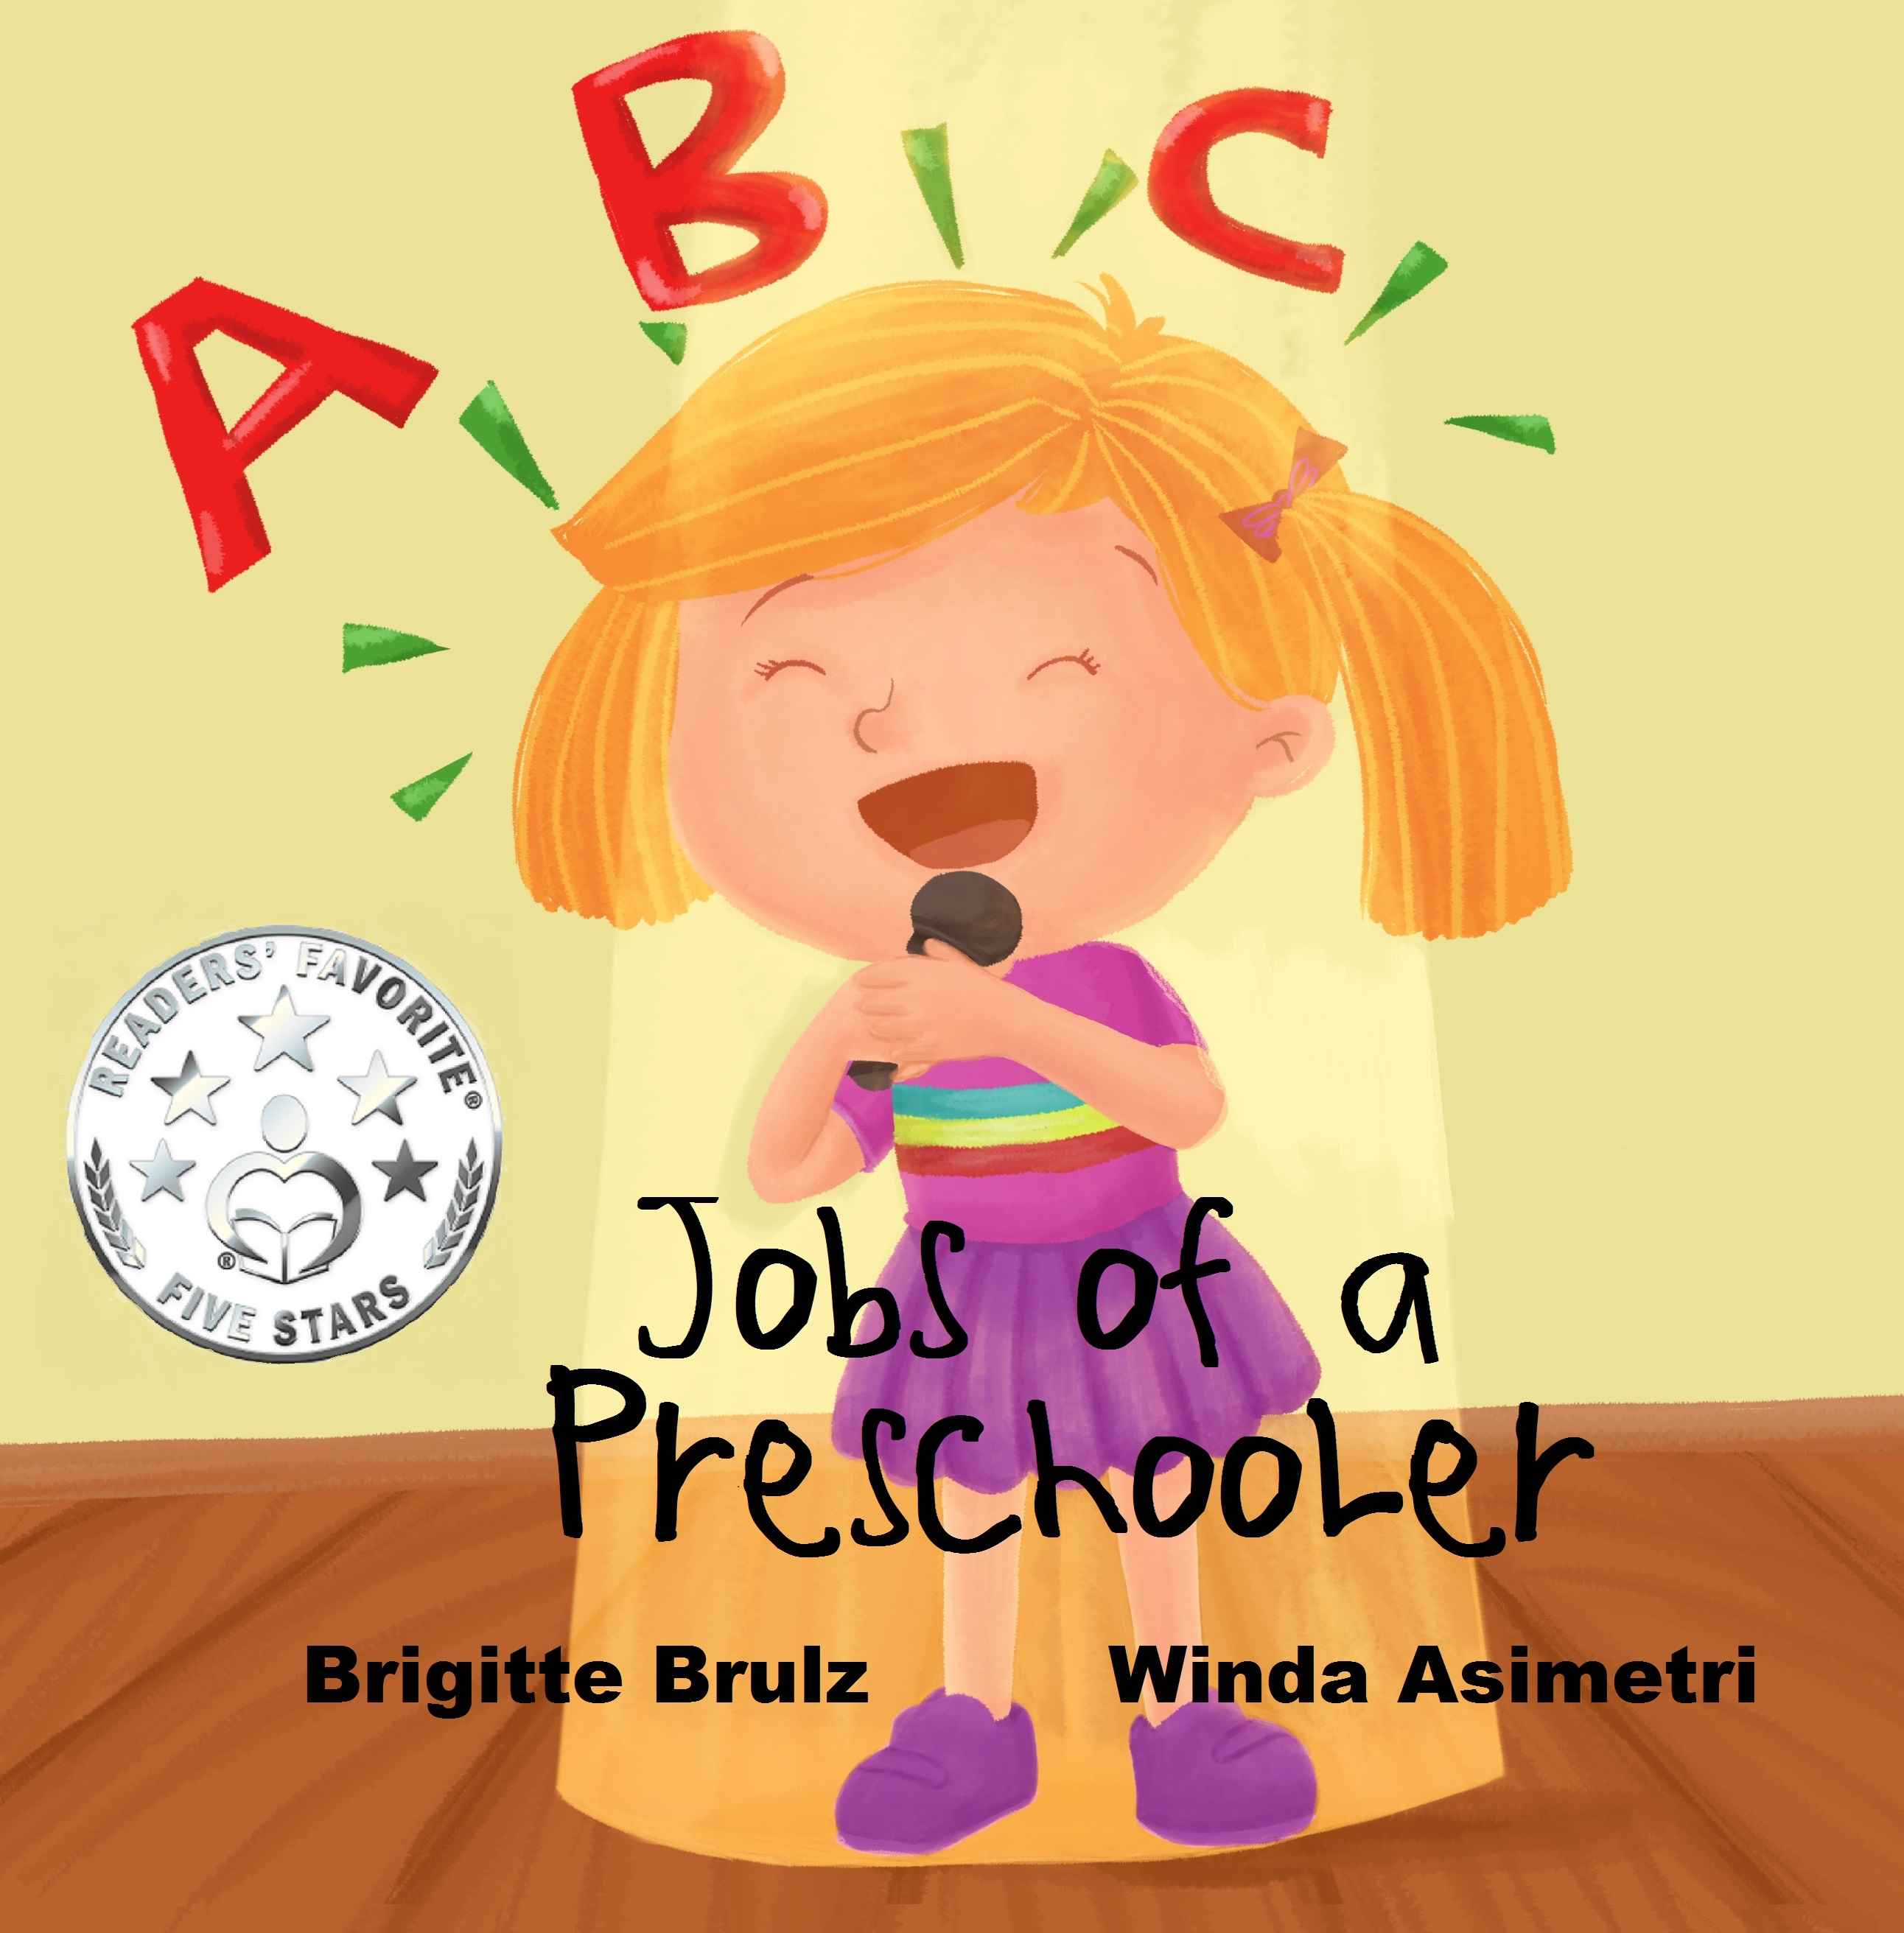 Jobs of a Preschooler book